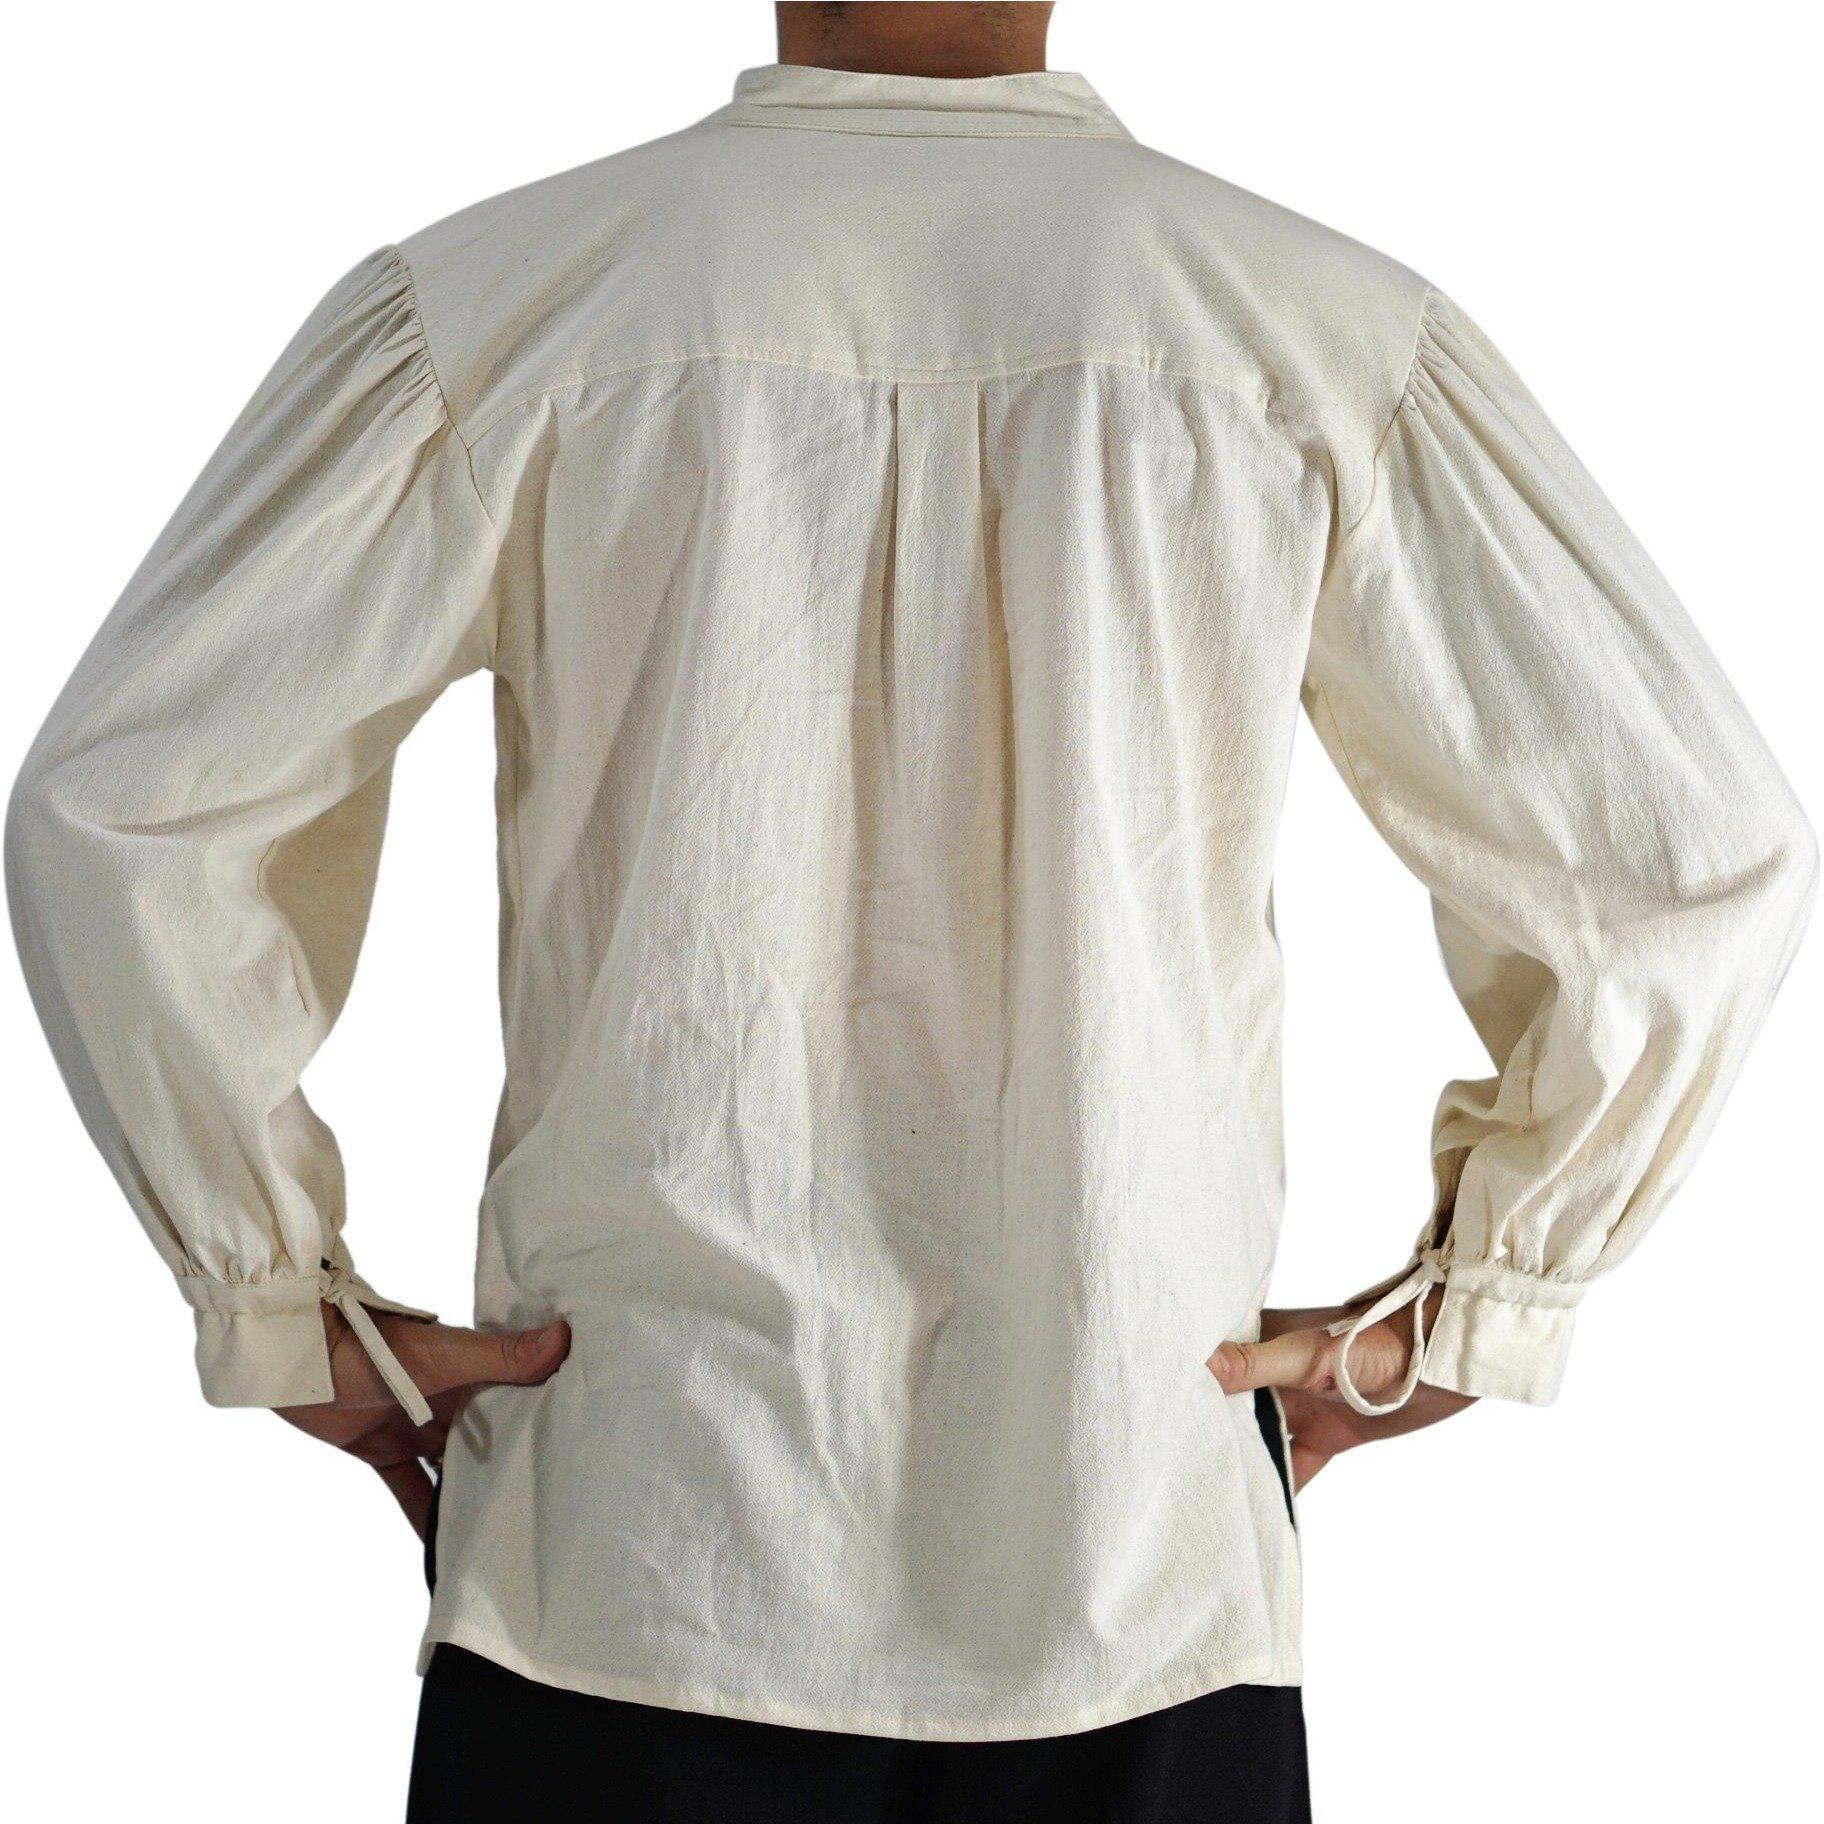 'Merchant' High Collar, Renaissance Festival Costume Shirt, Pirate, Steampunk - Cream/Off White by Zootzu (Image #3)